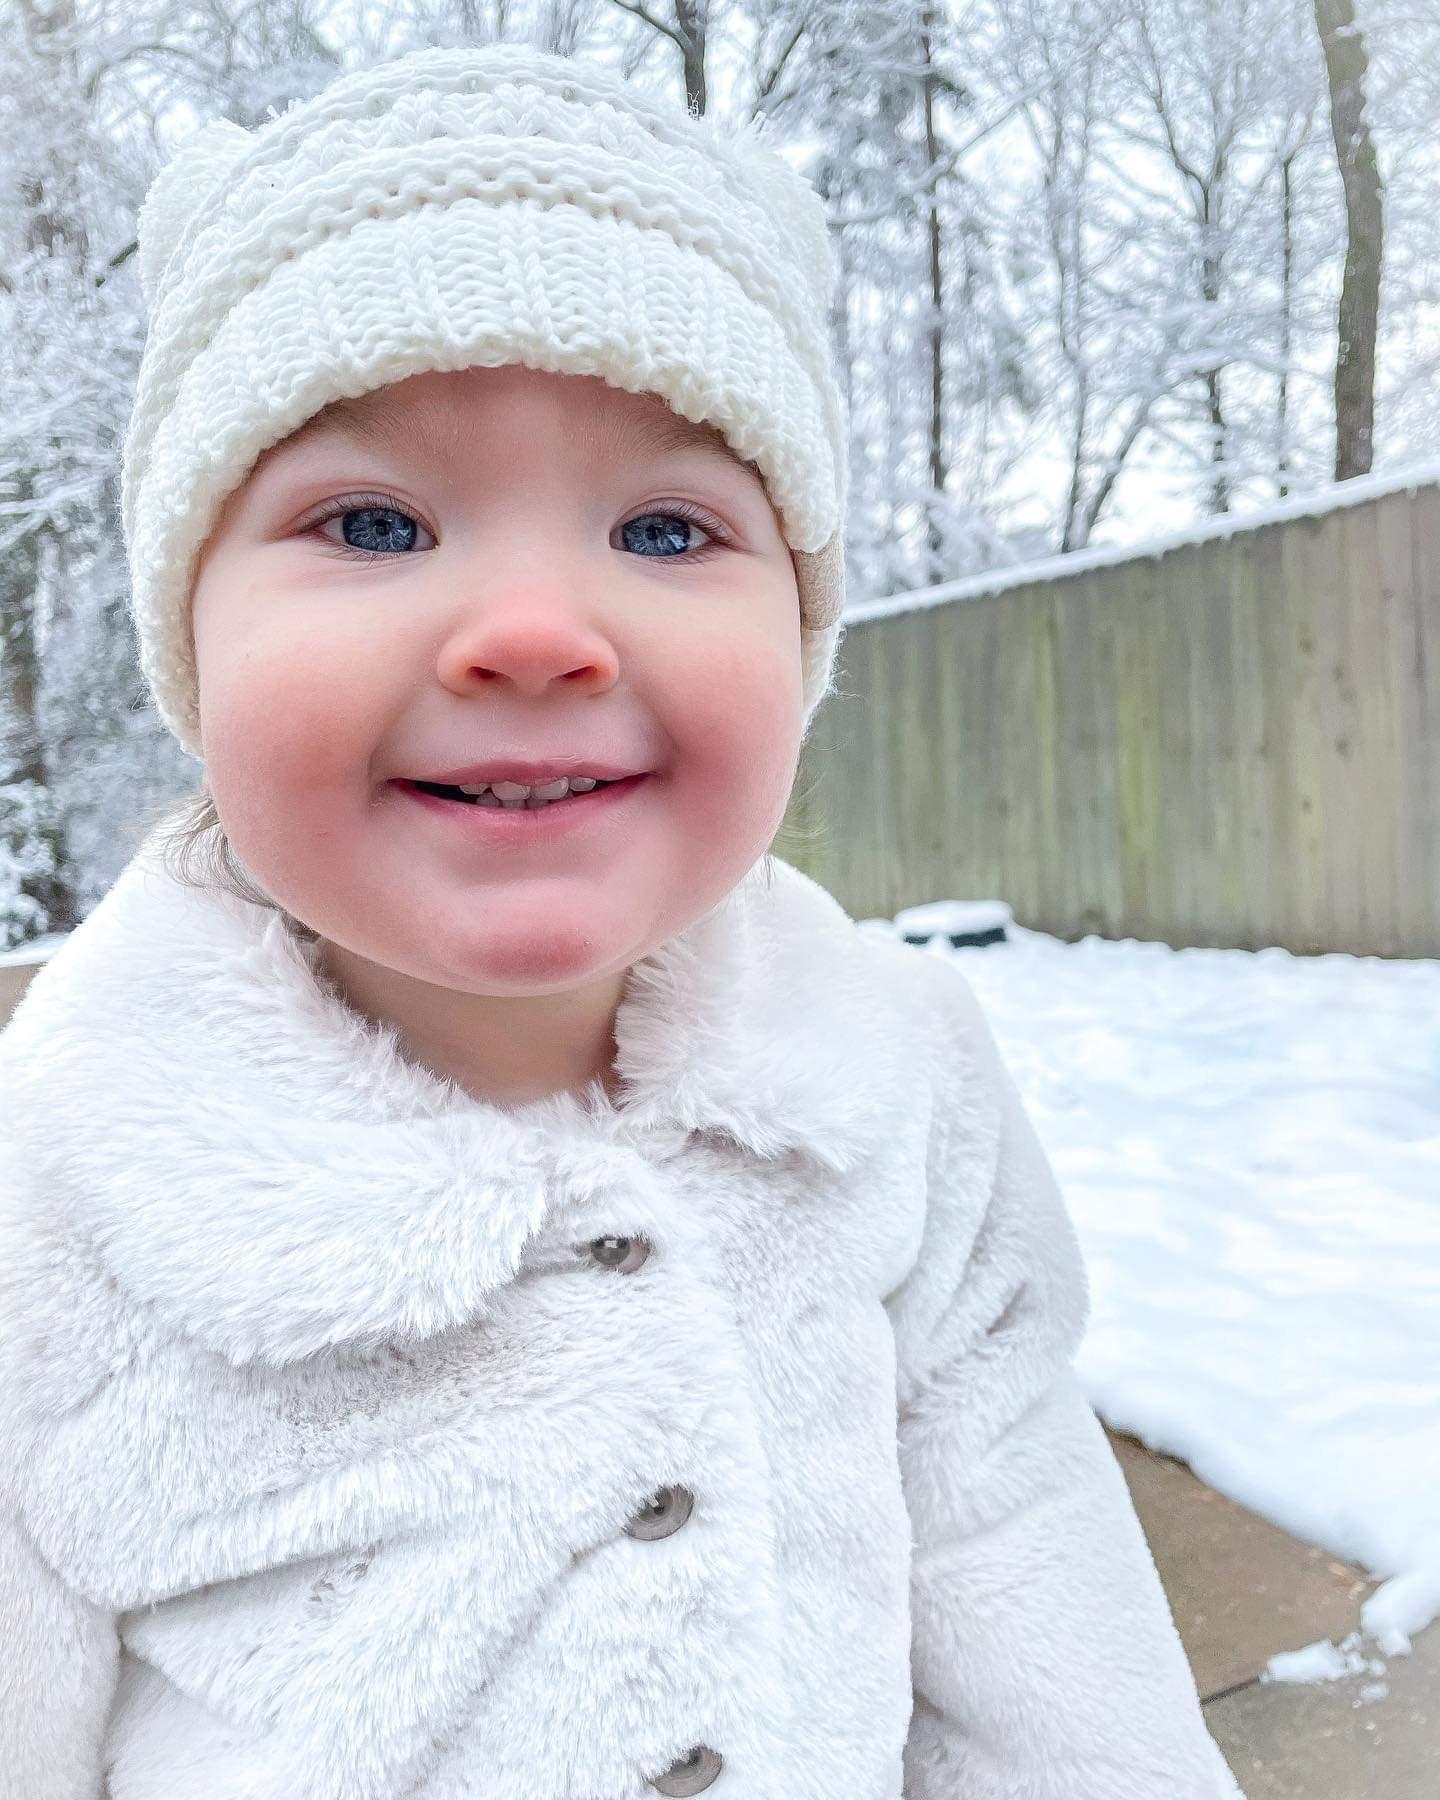 Lorelei Crowell, 17 months